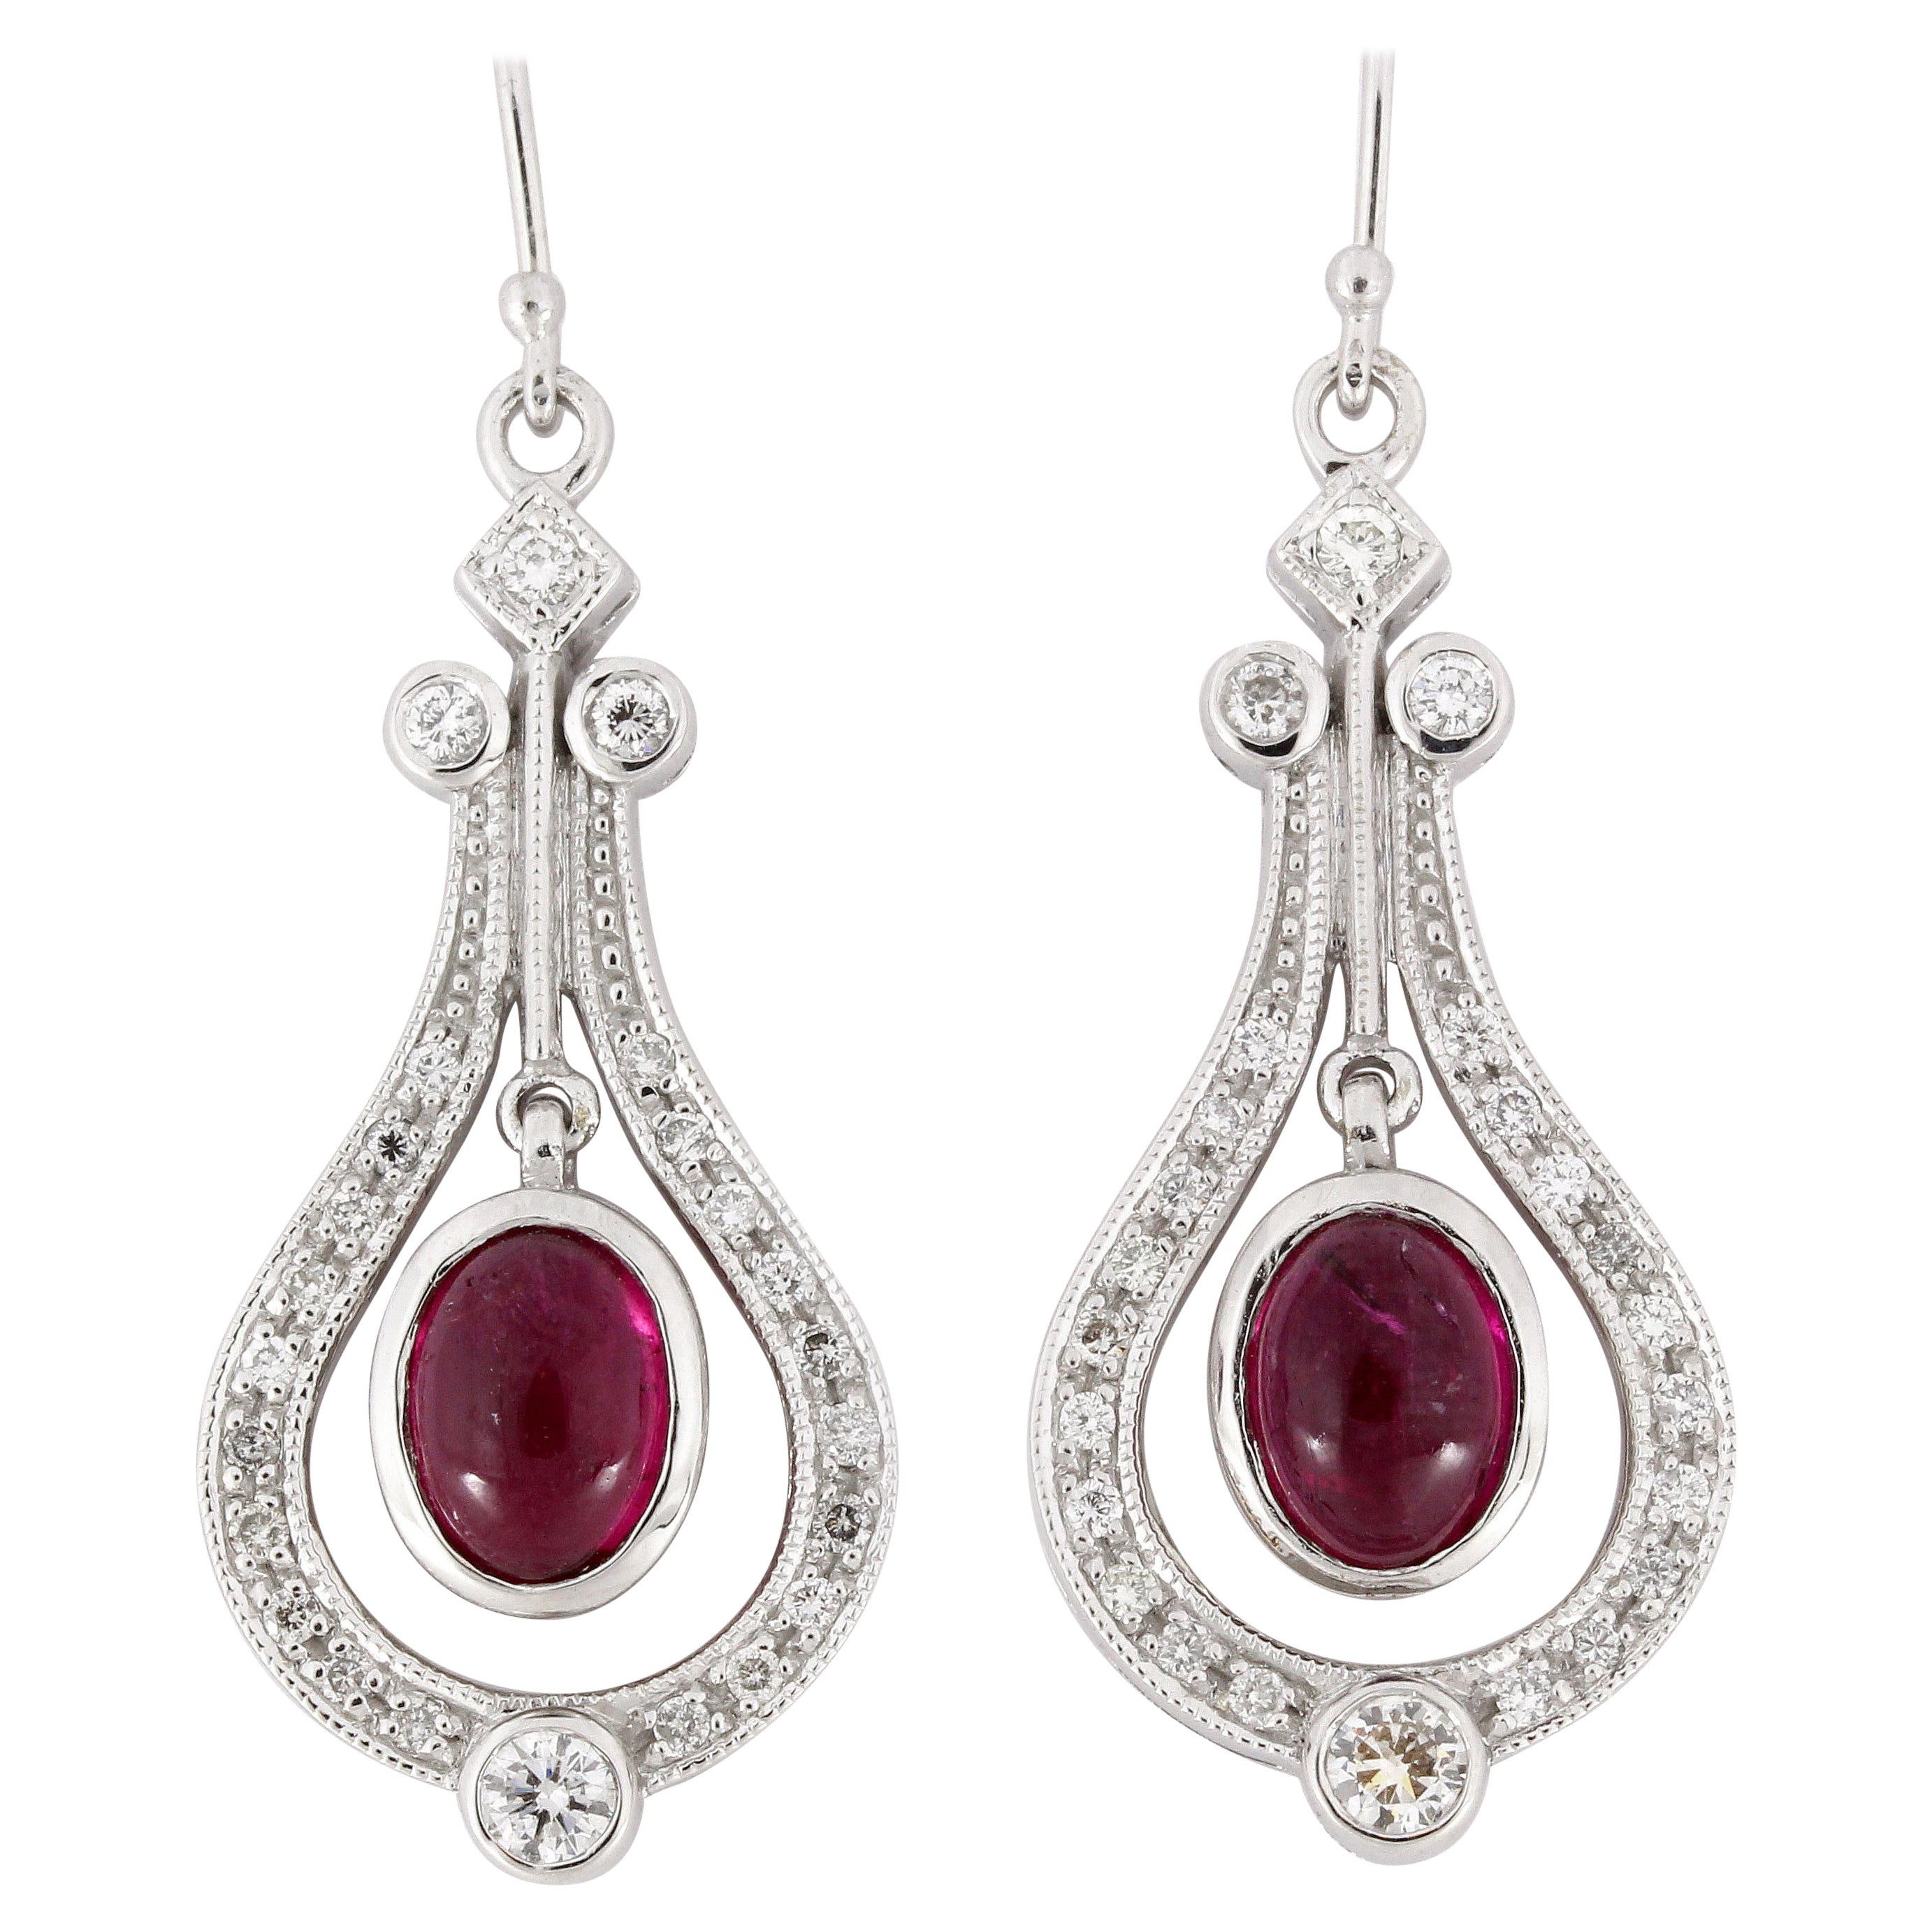 2.6 Carat Cabochon Ruby Diamond Drop Earrings